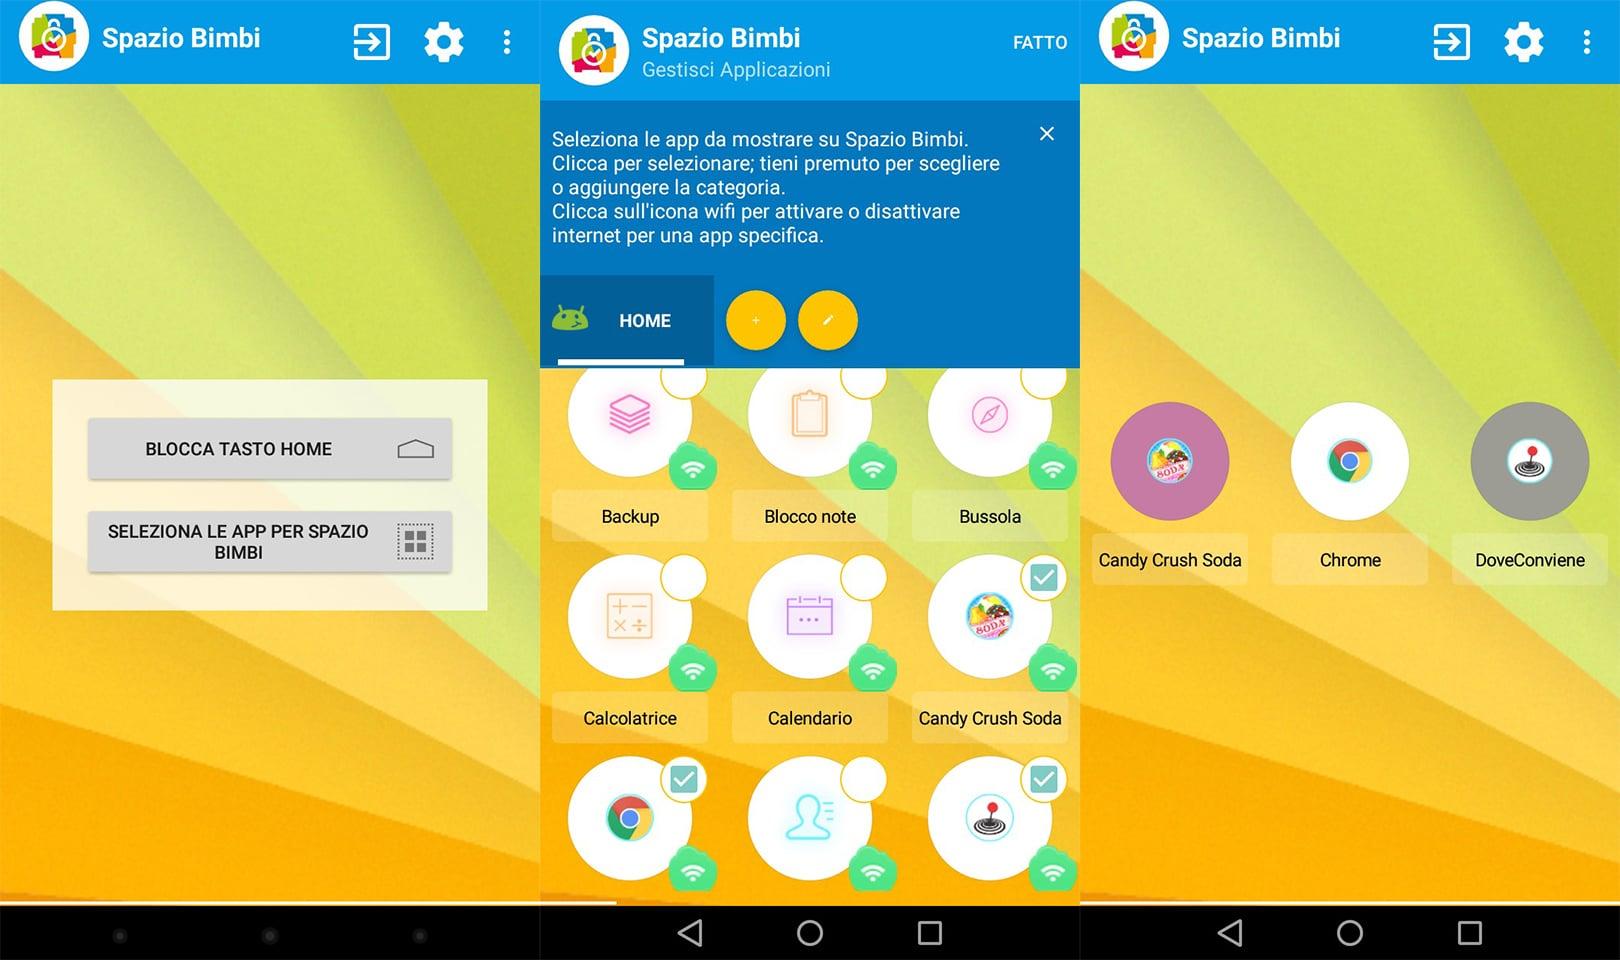 Spazio Bimbi app